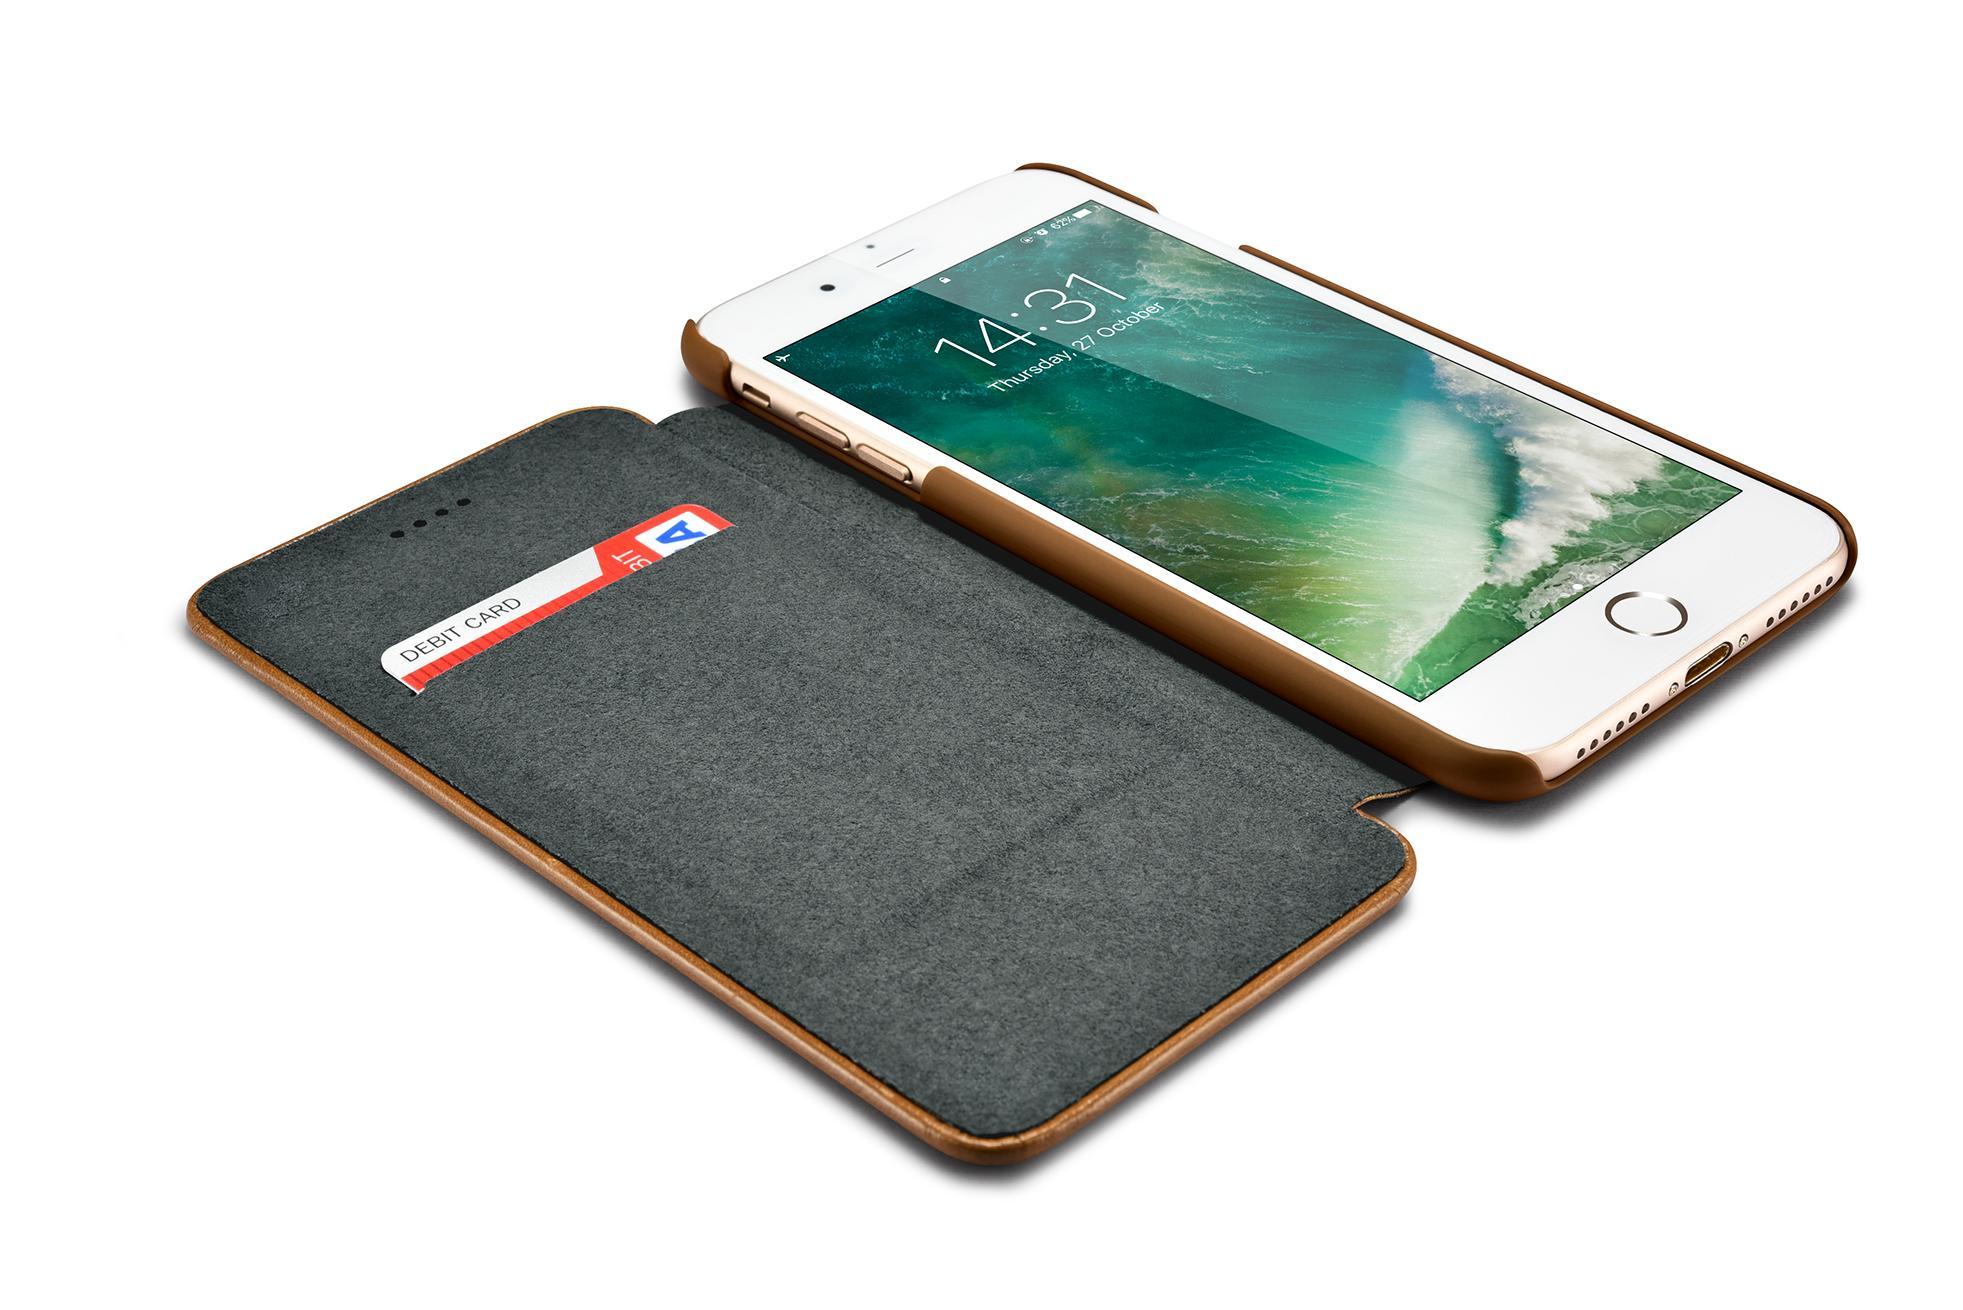 Xoomz iPhone 7 Silmarillion Leather Side Open Case 7